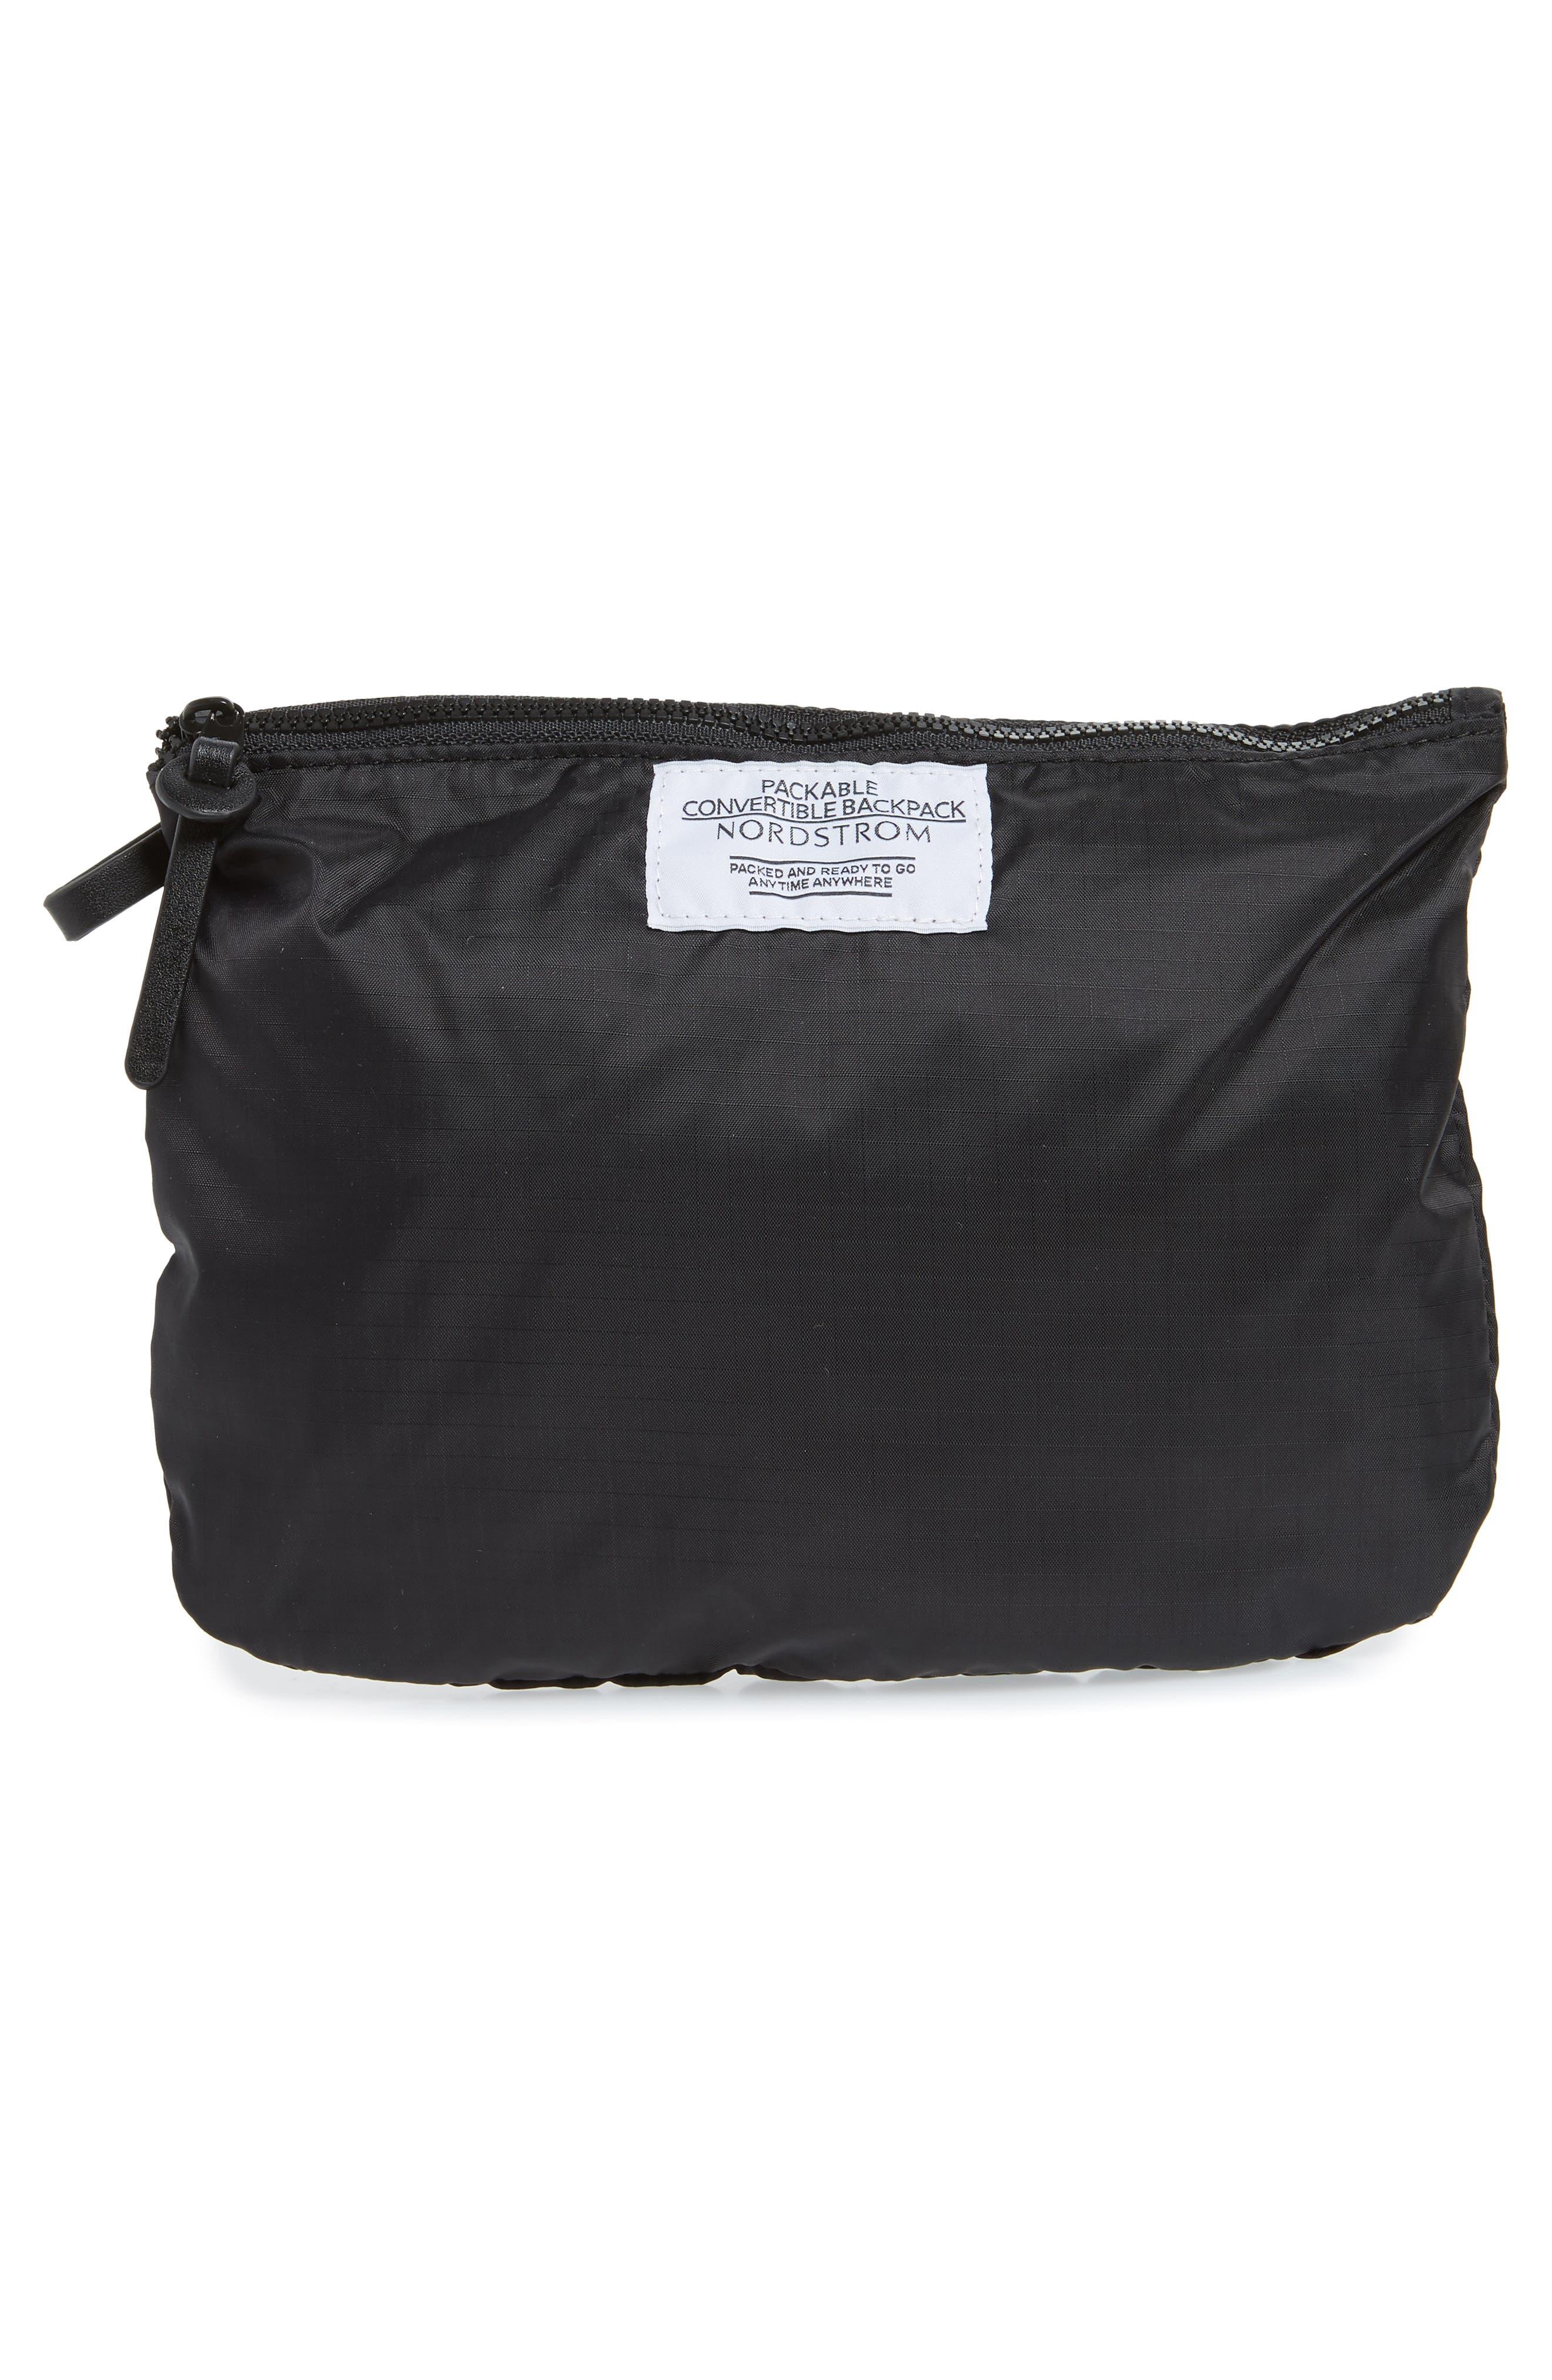 Packable Convertible Backpack,                             Alternate thumbnail 8, color,                             BLACK